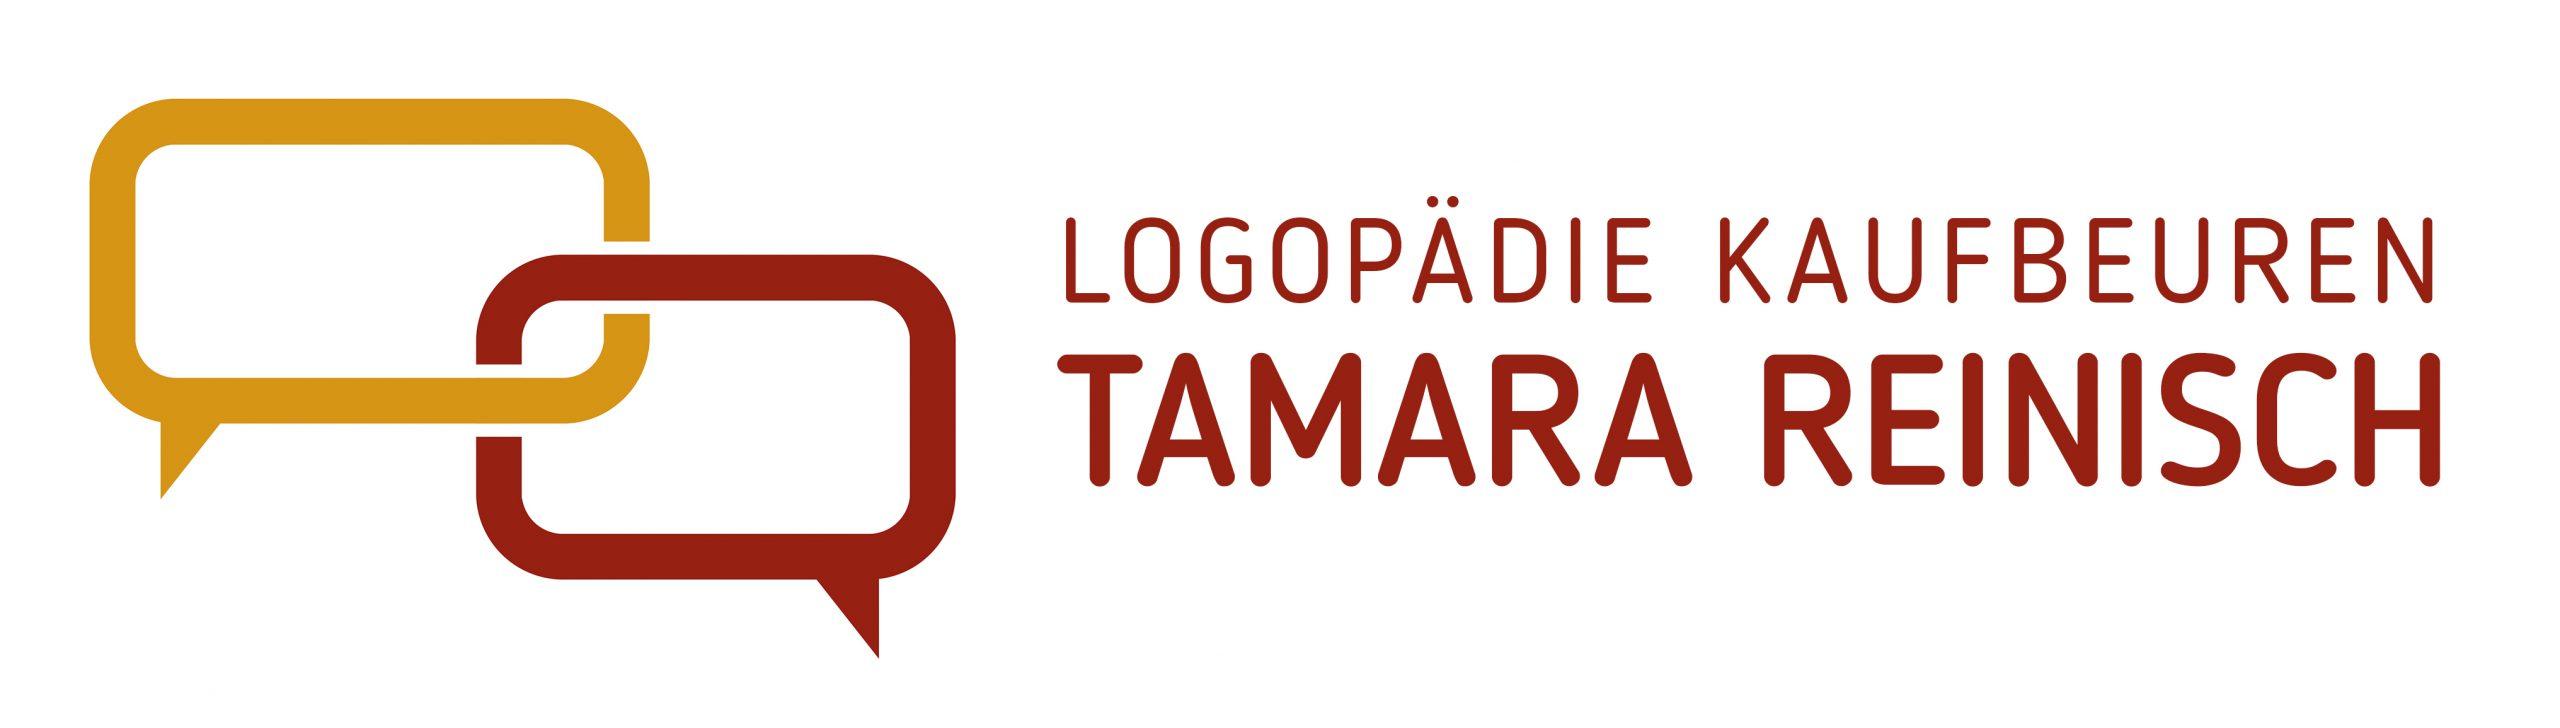 Logopädie Reinisch Tamara